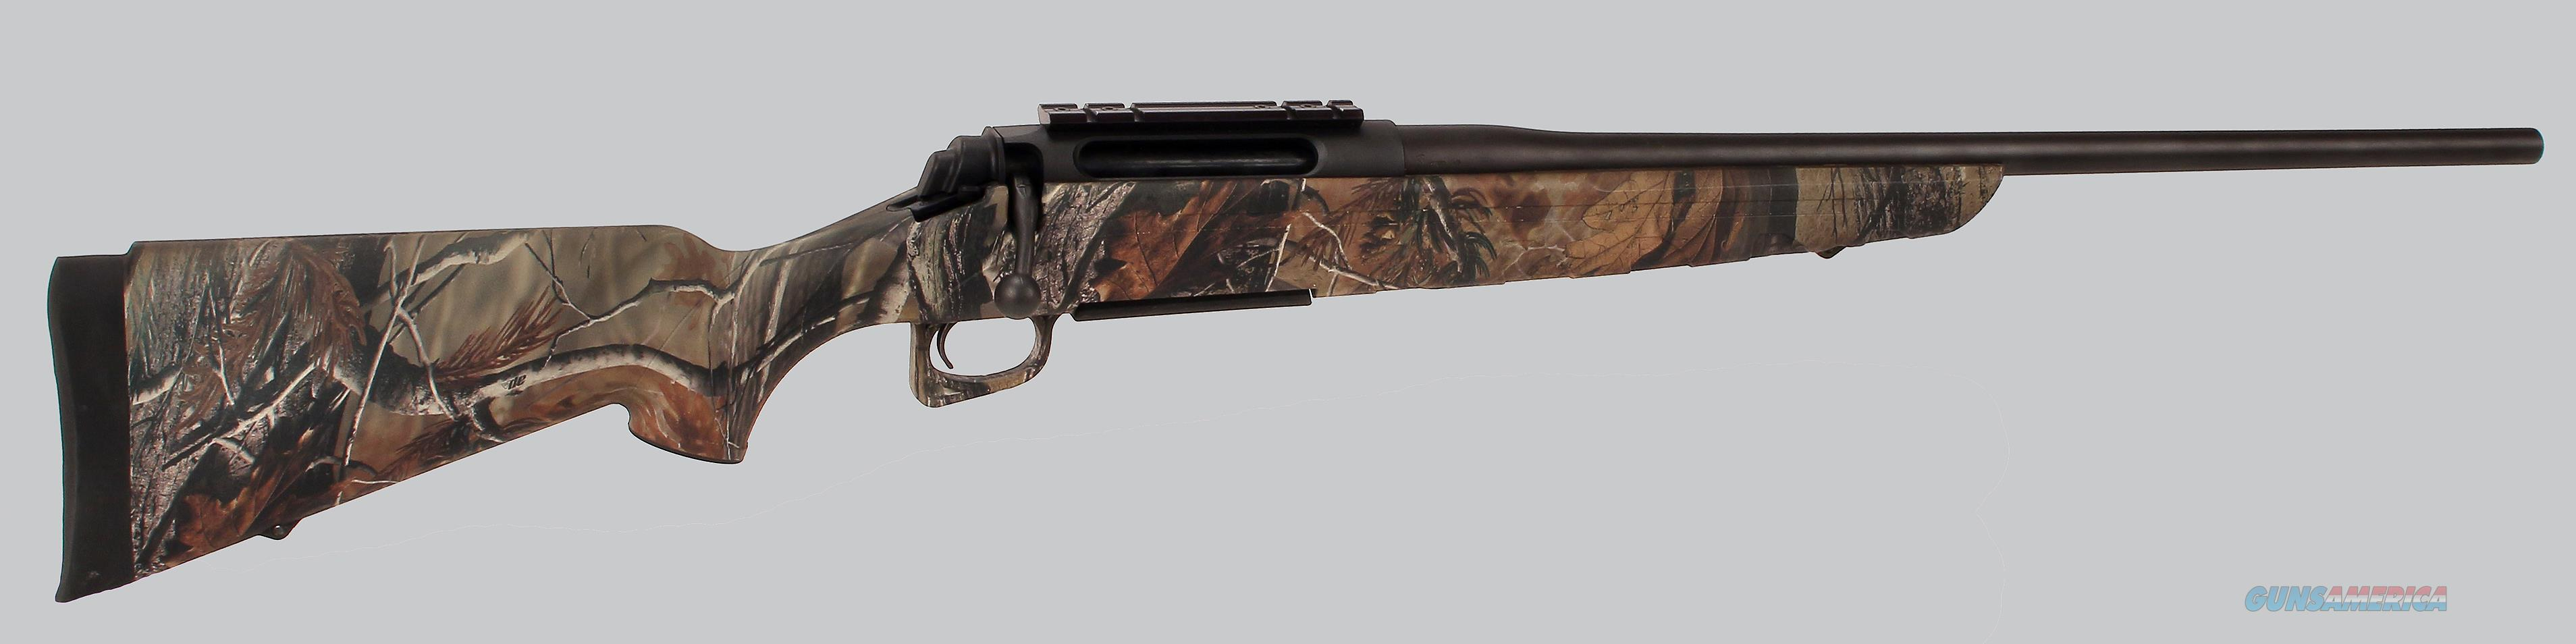 Remington 770 Bolt 243 Rifle  Guns > Rifles > Remington Rifles - Modern > Bolt Action Non-Model 700 > Sporting